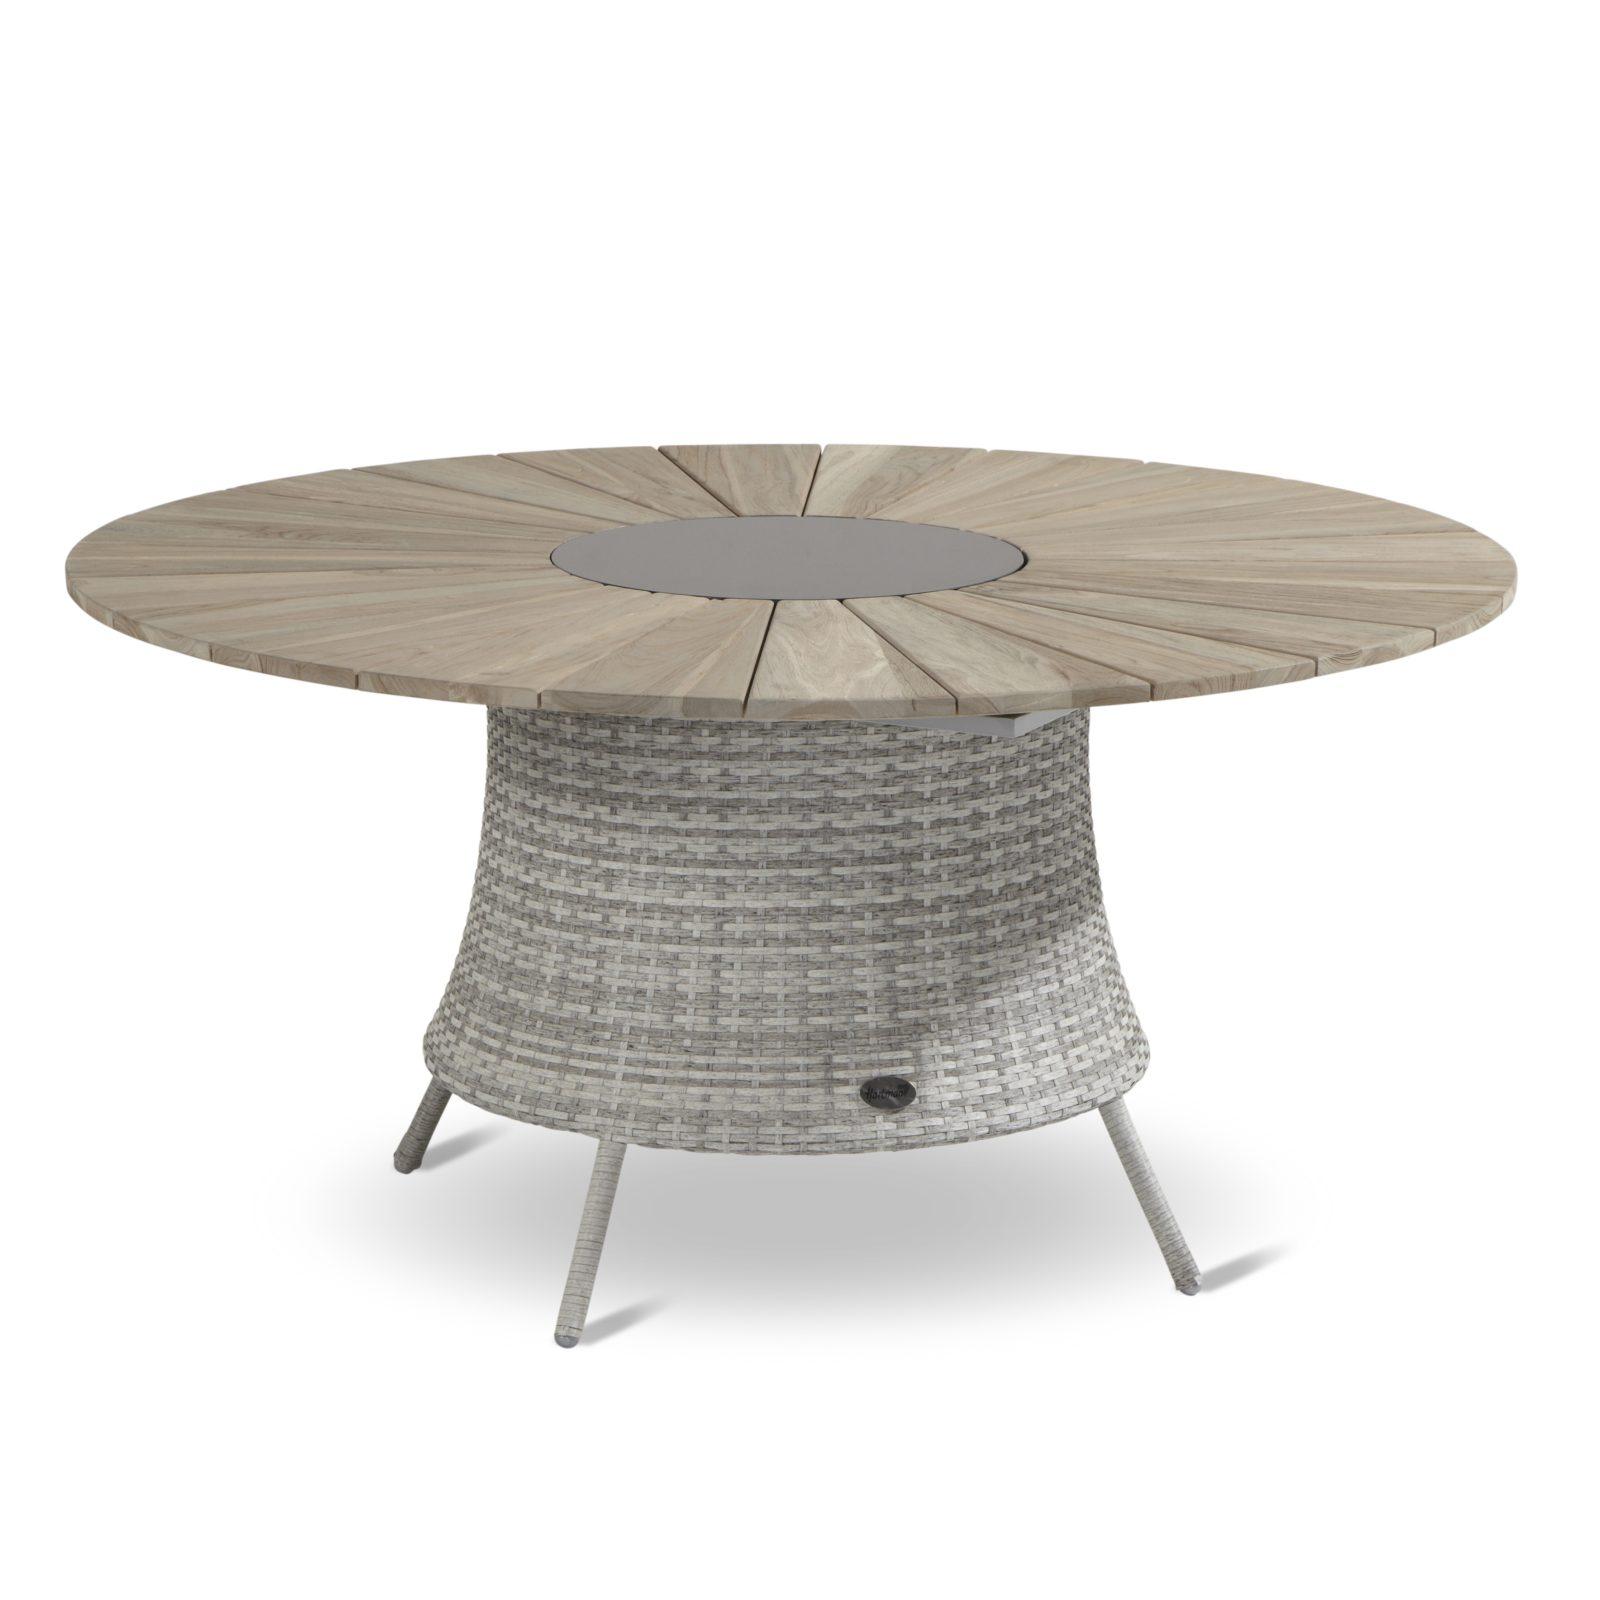 Provence havebord polyrattan flet og teak bordplade 30139, 30132